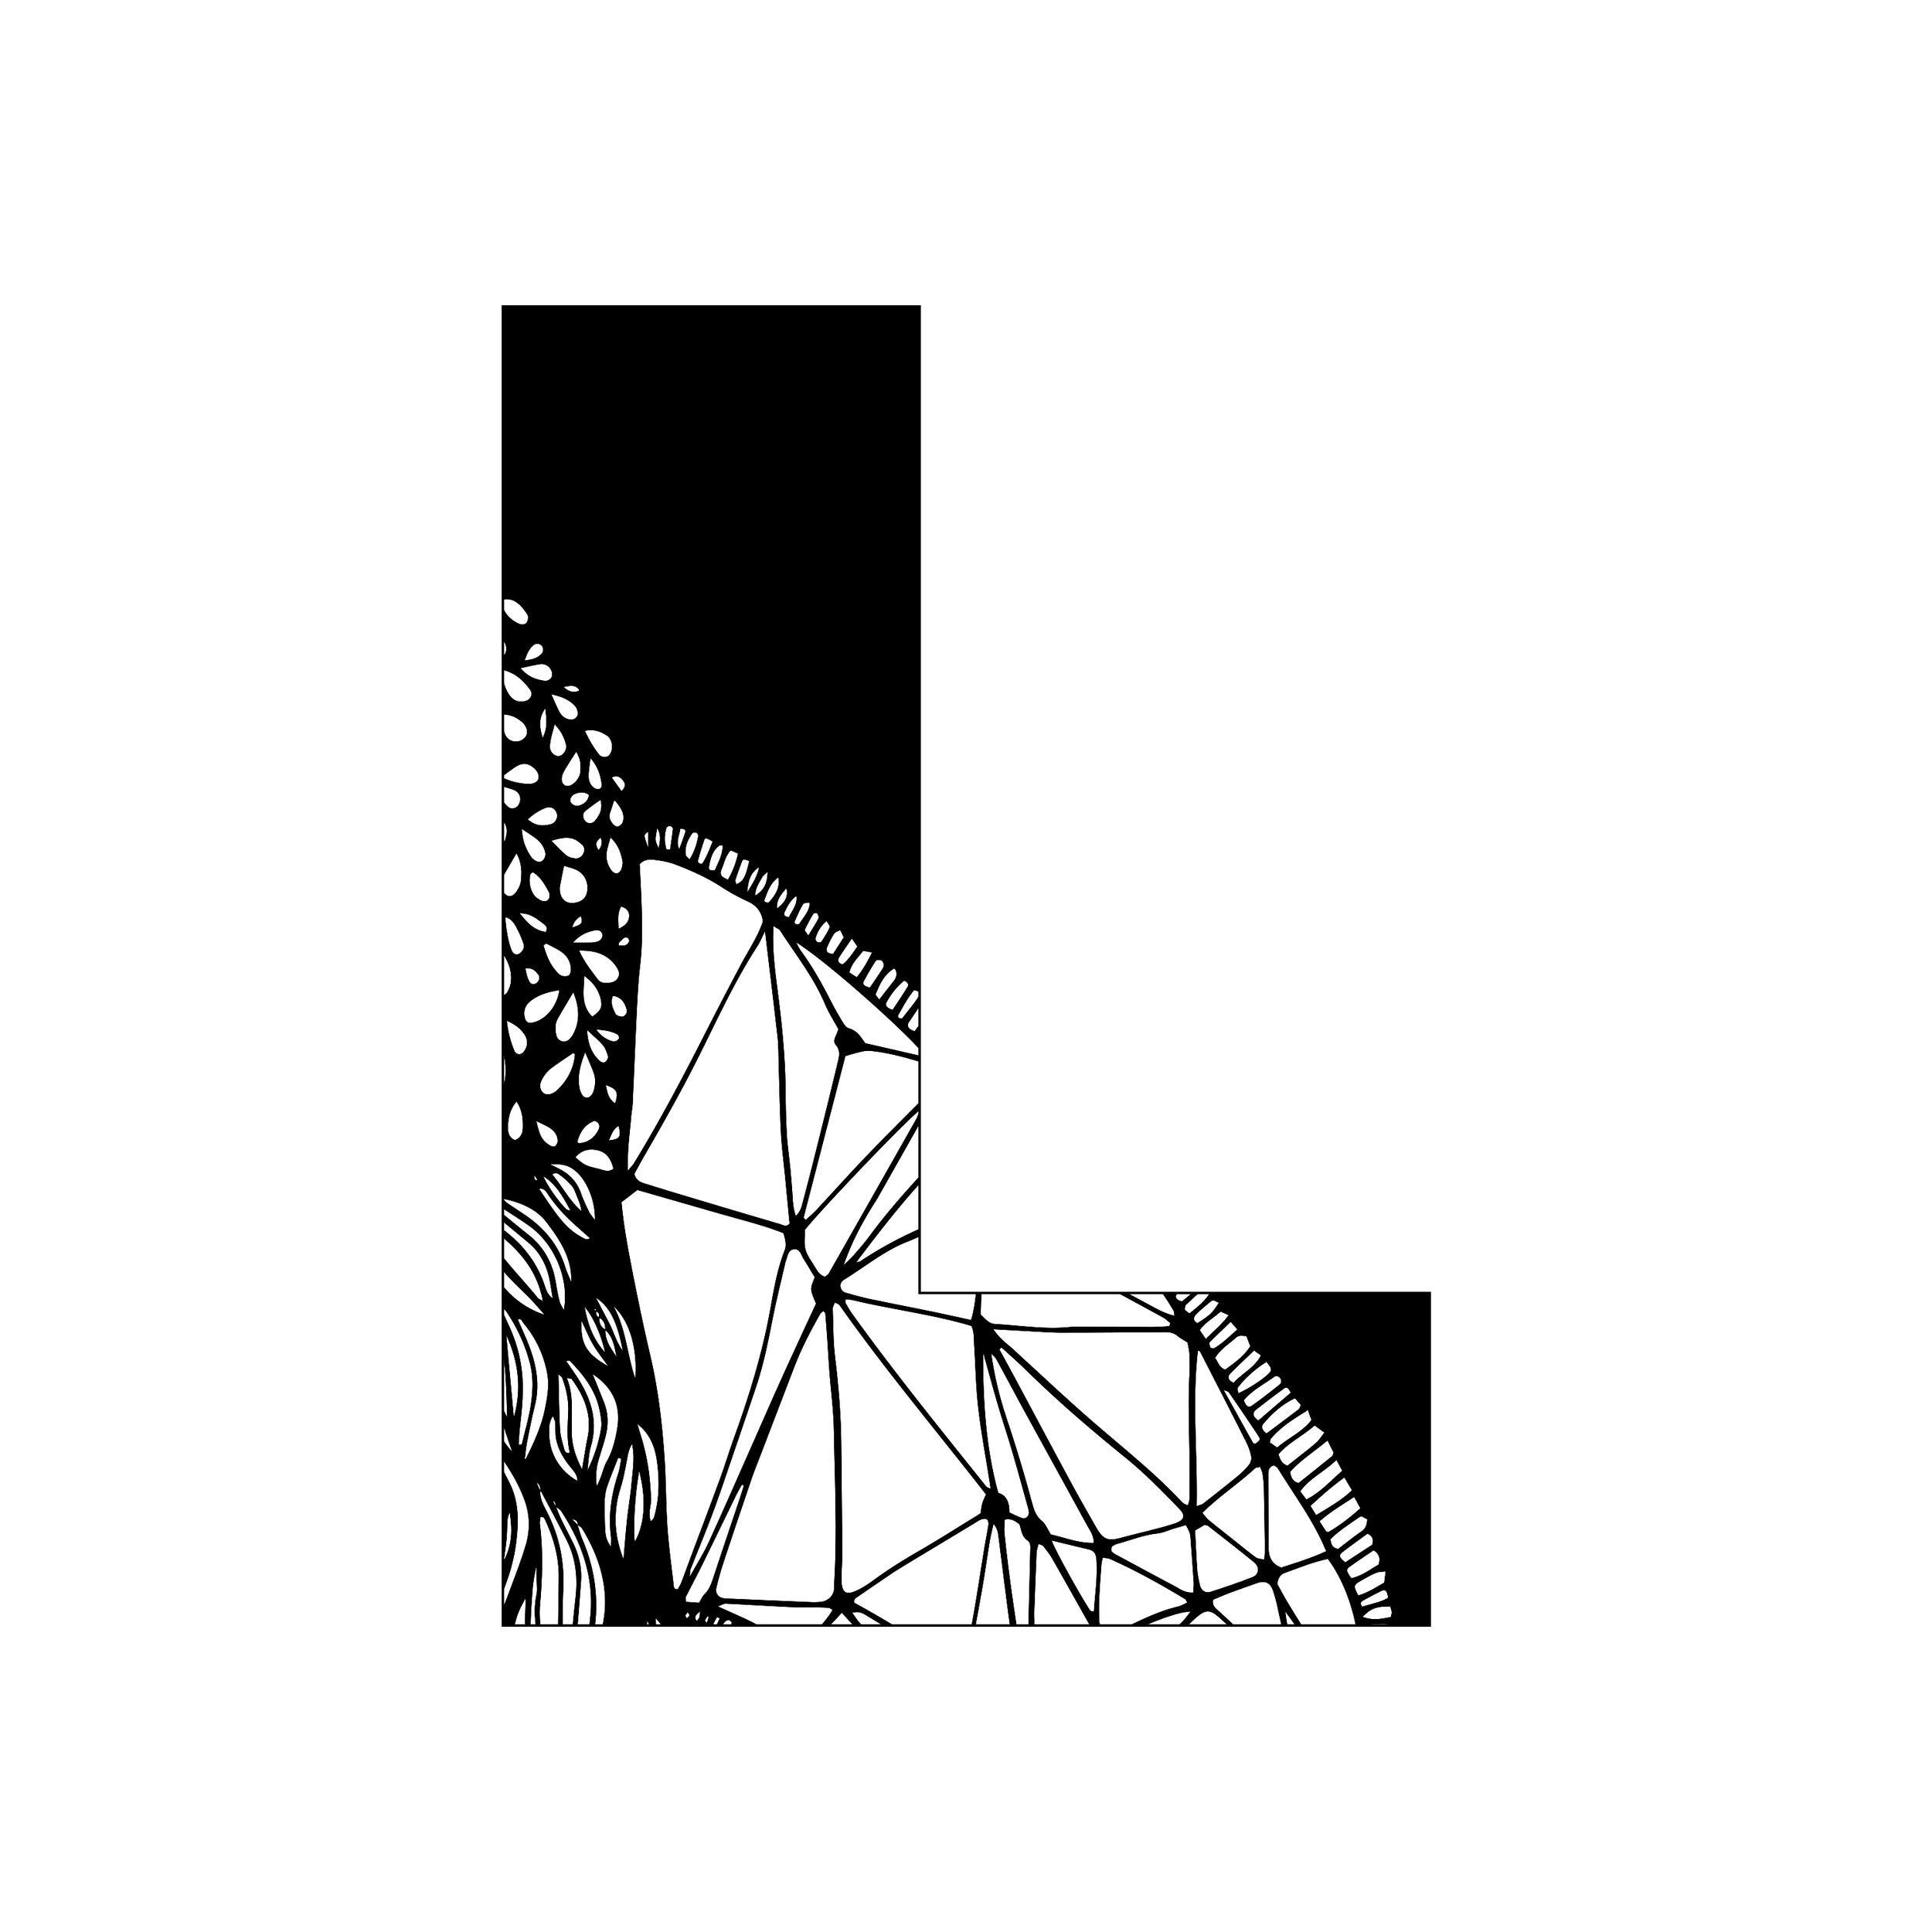 L 1-1.jpg